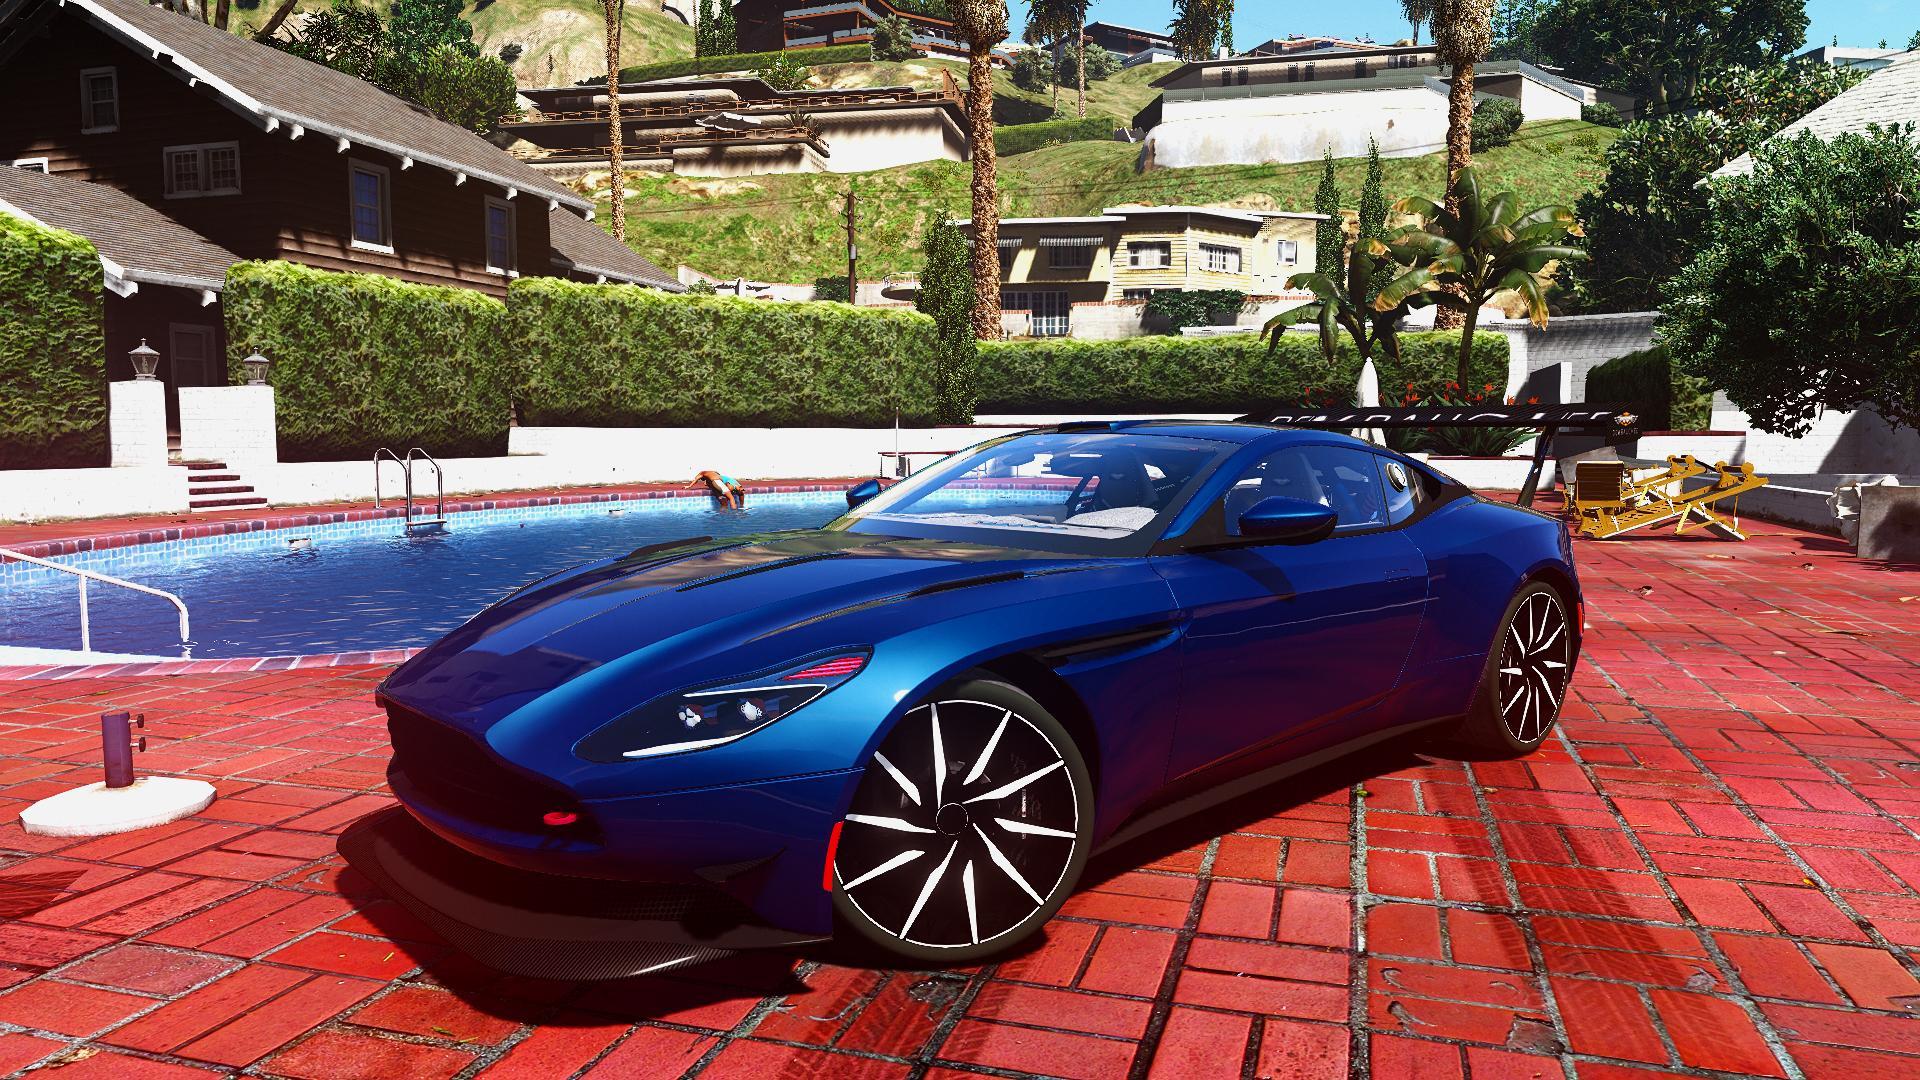 2016 Aston Martin Db11 Add On Replace Unlocked Tuning Gta5 Mods Com